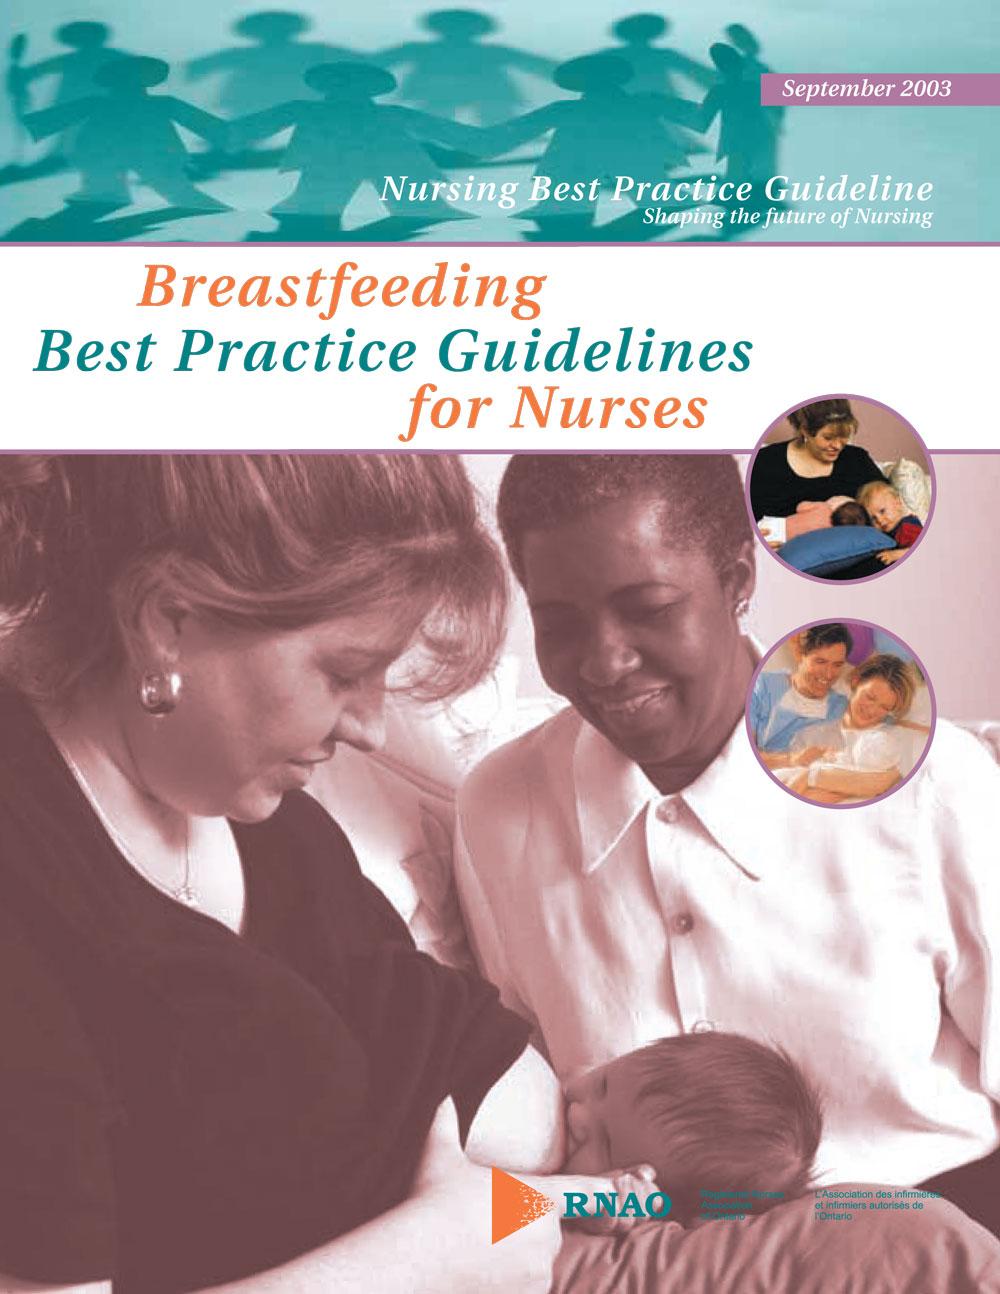 Breastfeeding Educational Resources MotherInfant Self Reflection Breastfeeding Best Practice Guidelines For Nurses Cover Breastfeeding Educational Resources Motherinfant Selfreflection Guide Nurse